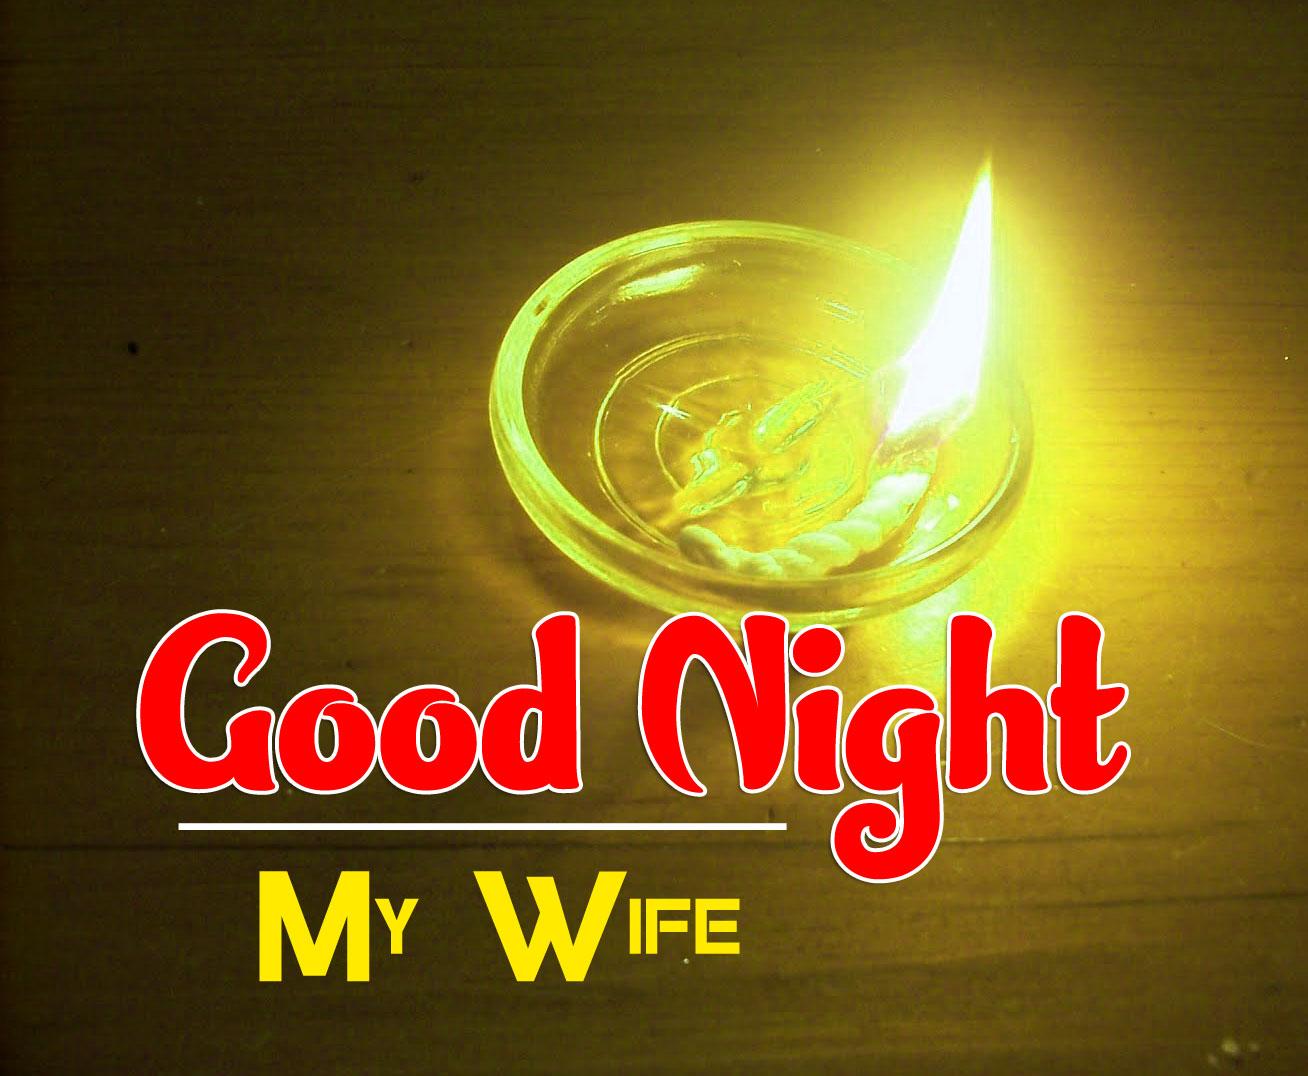 P Good Night Images Wallpaper New